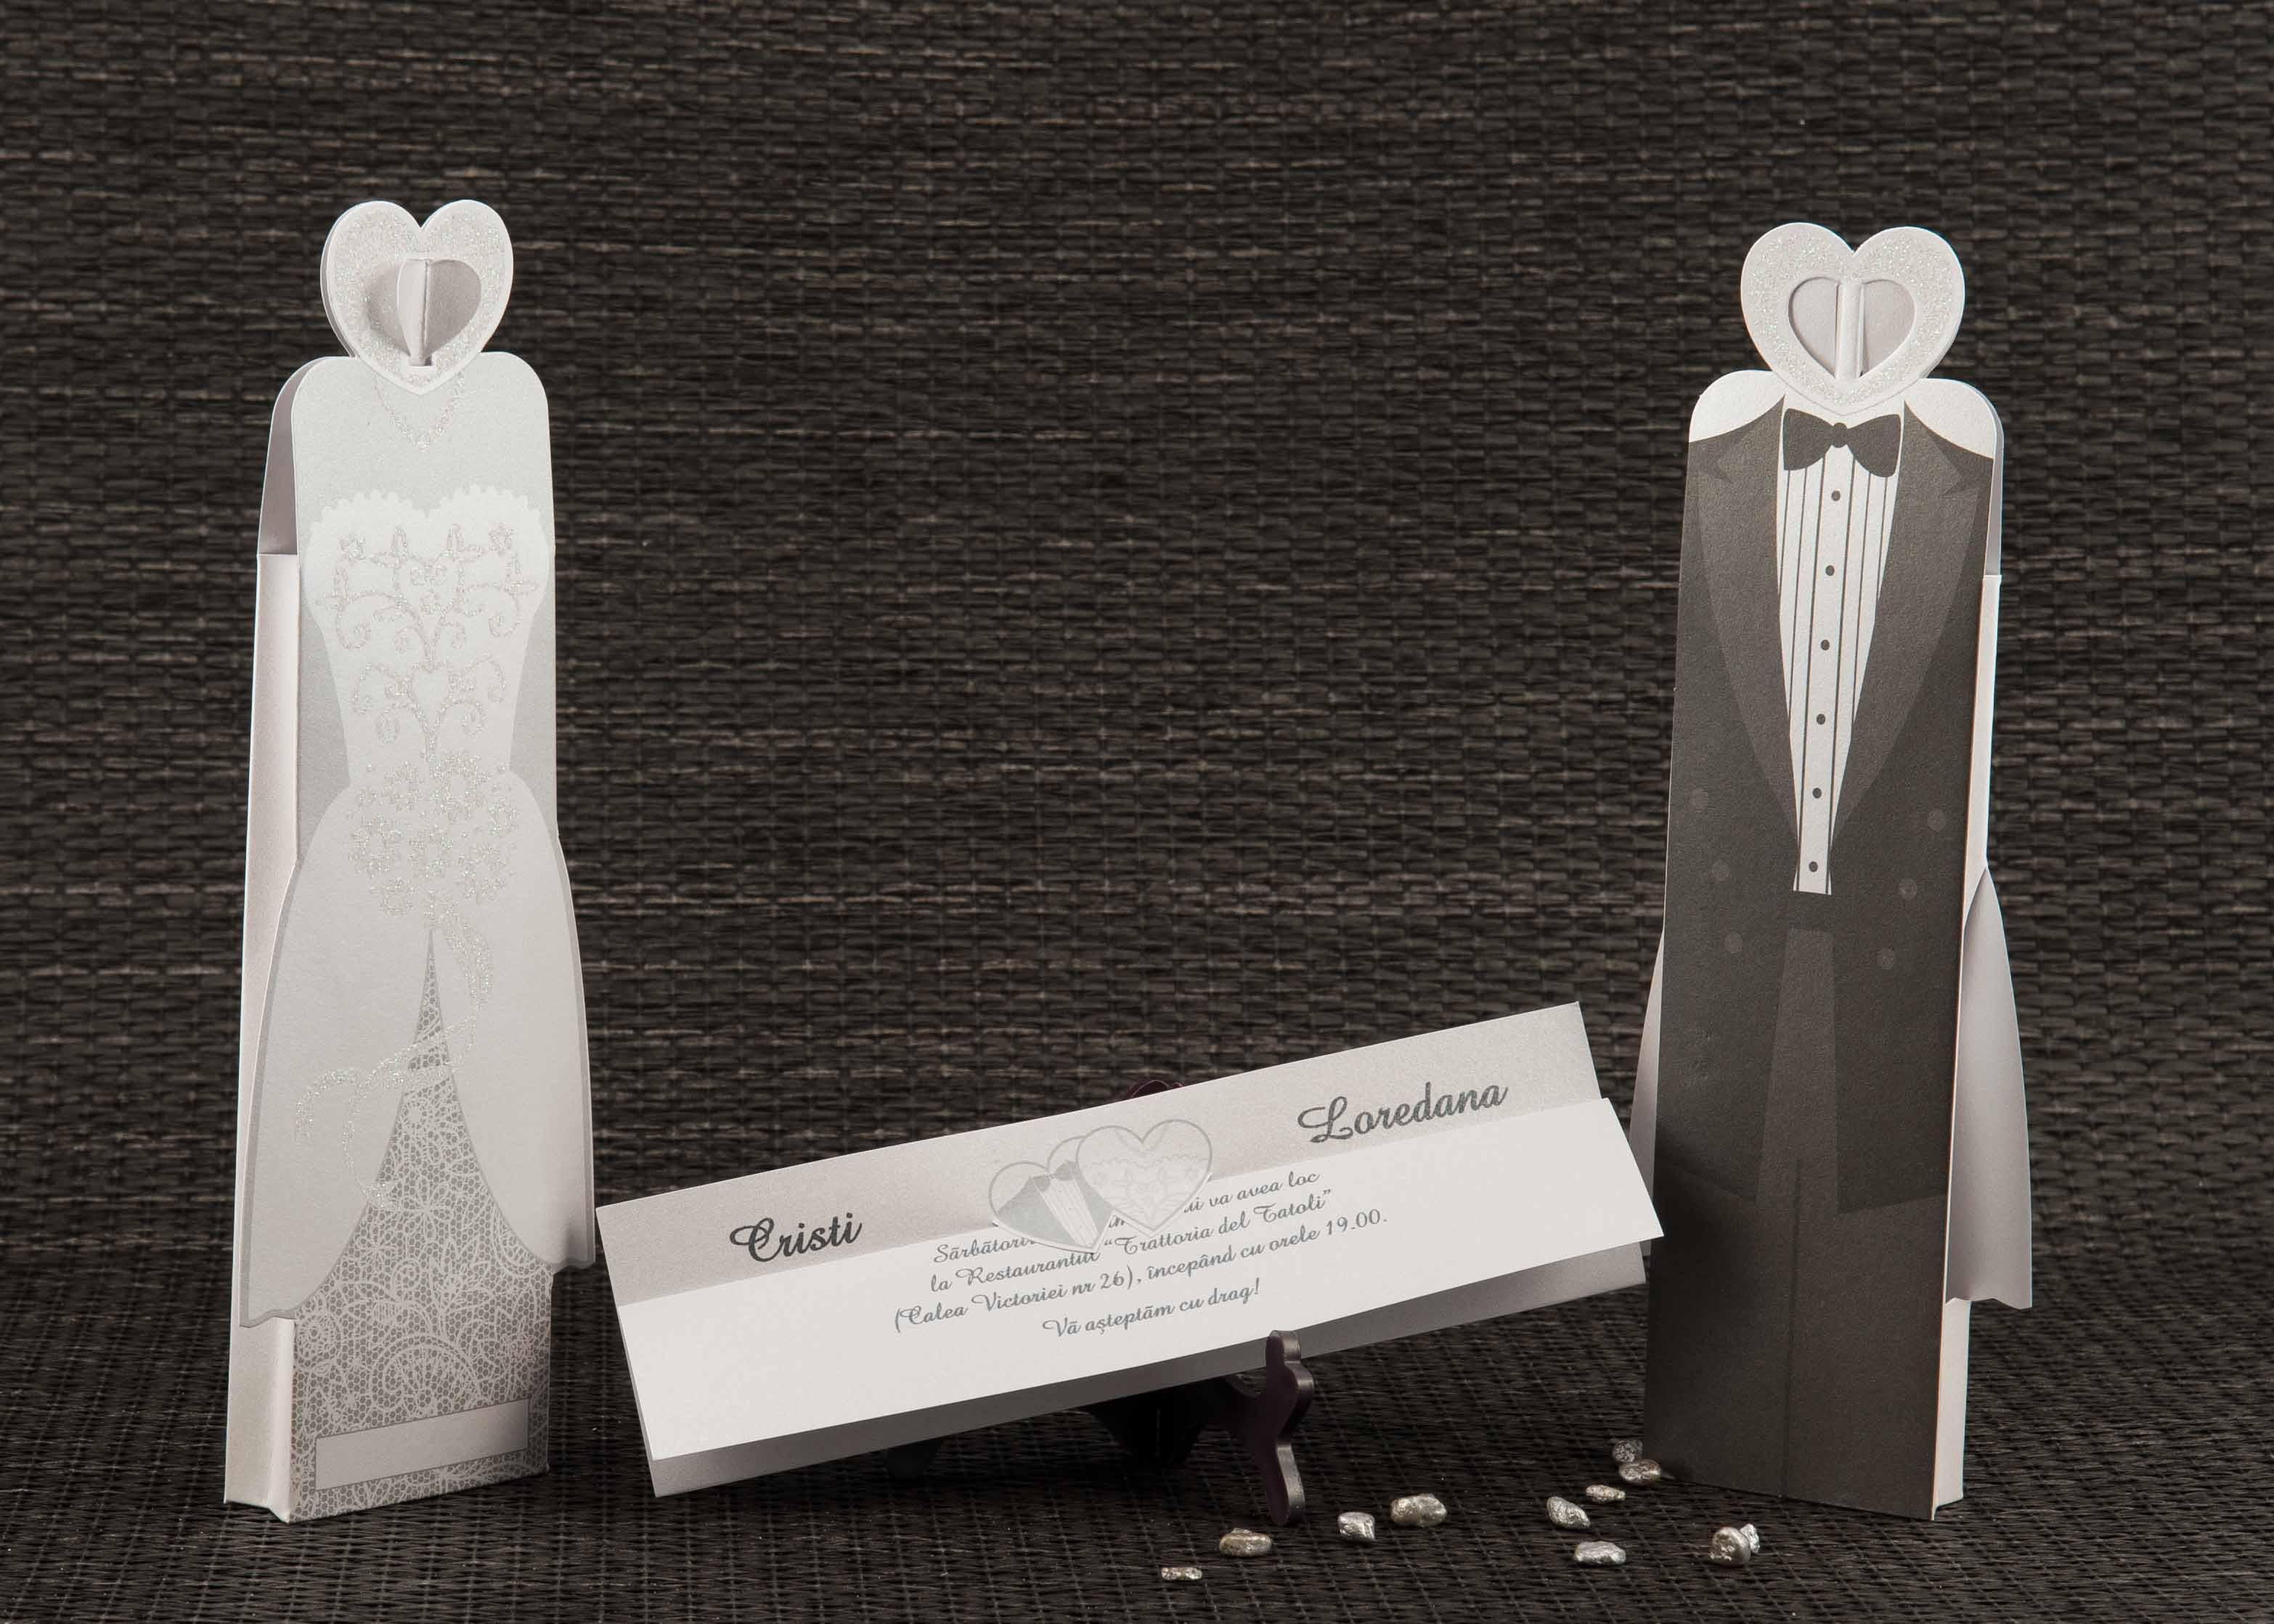 Invitatii Nunta Invitatii Botez Marturii Plicuri Bani Carduri Masa